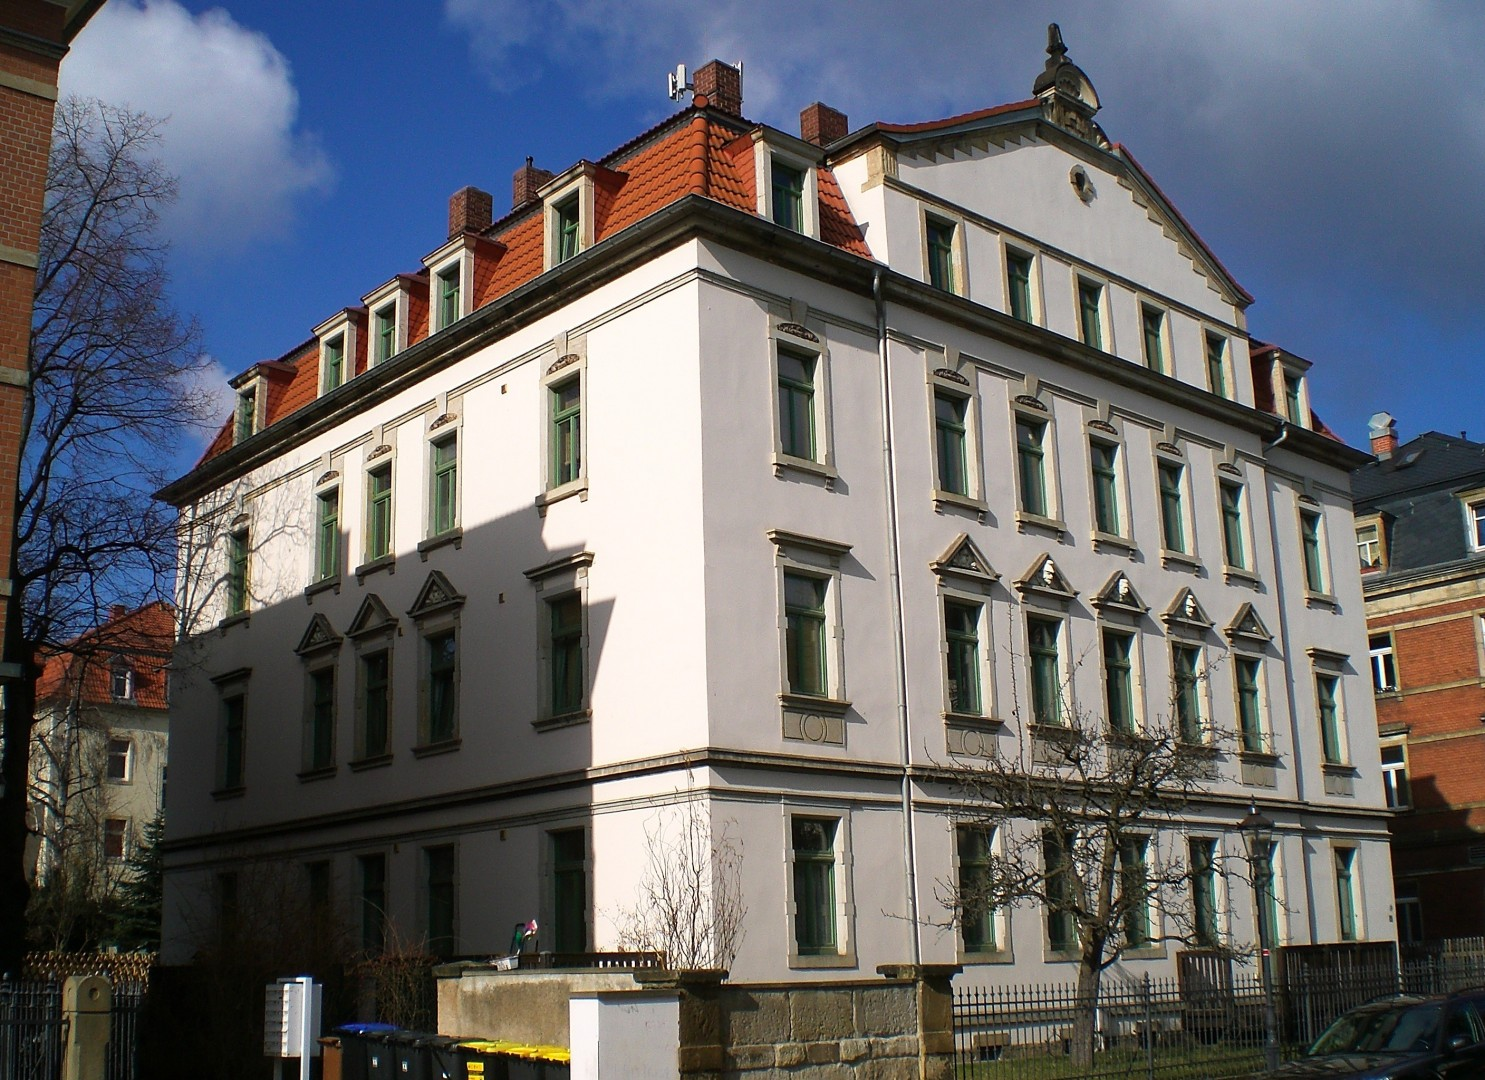 Klingenstraße 2